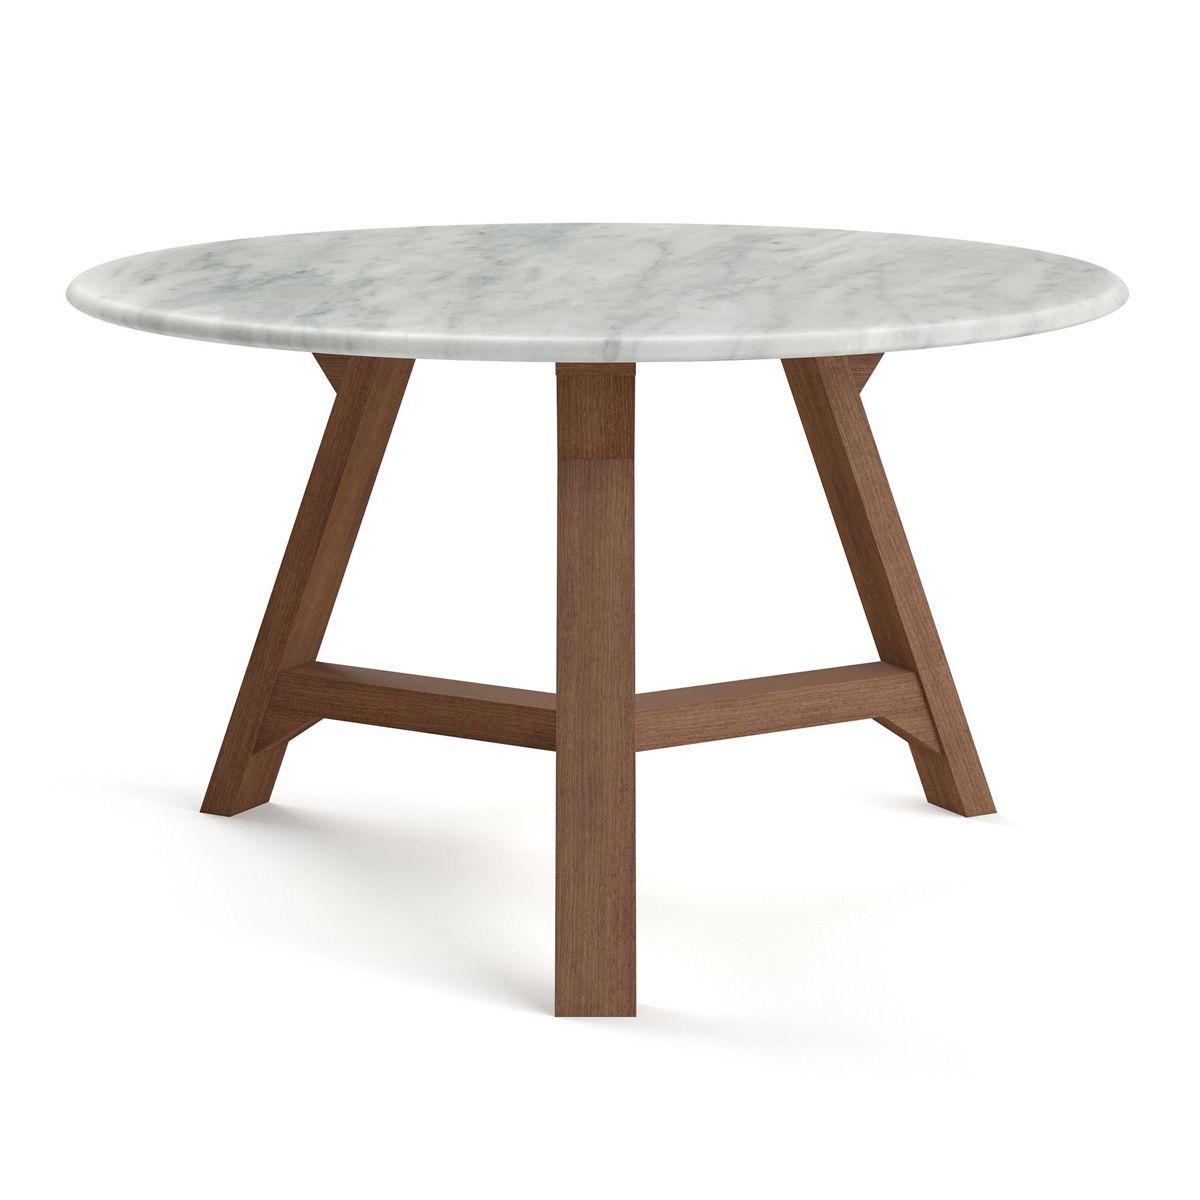 Anders Coffee Table Moveis De Madeira De Madeira Moveis [ 1200 x 1200 Pixel ]